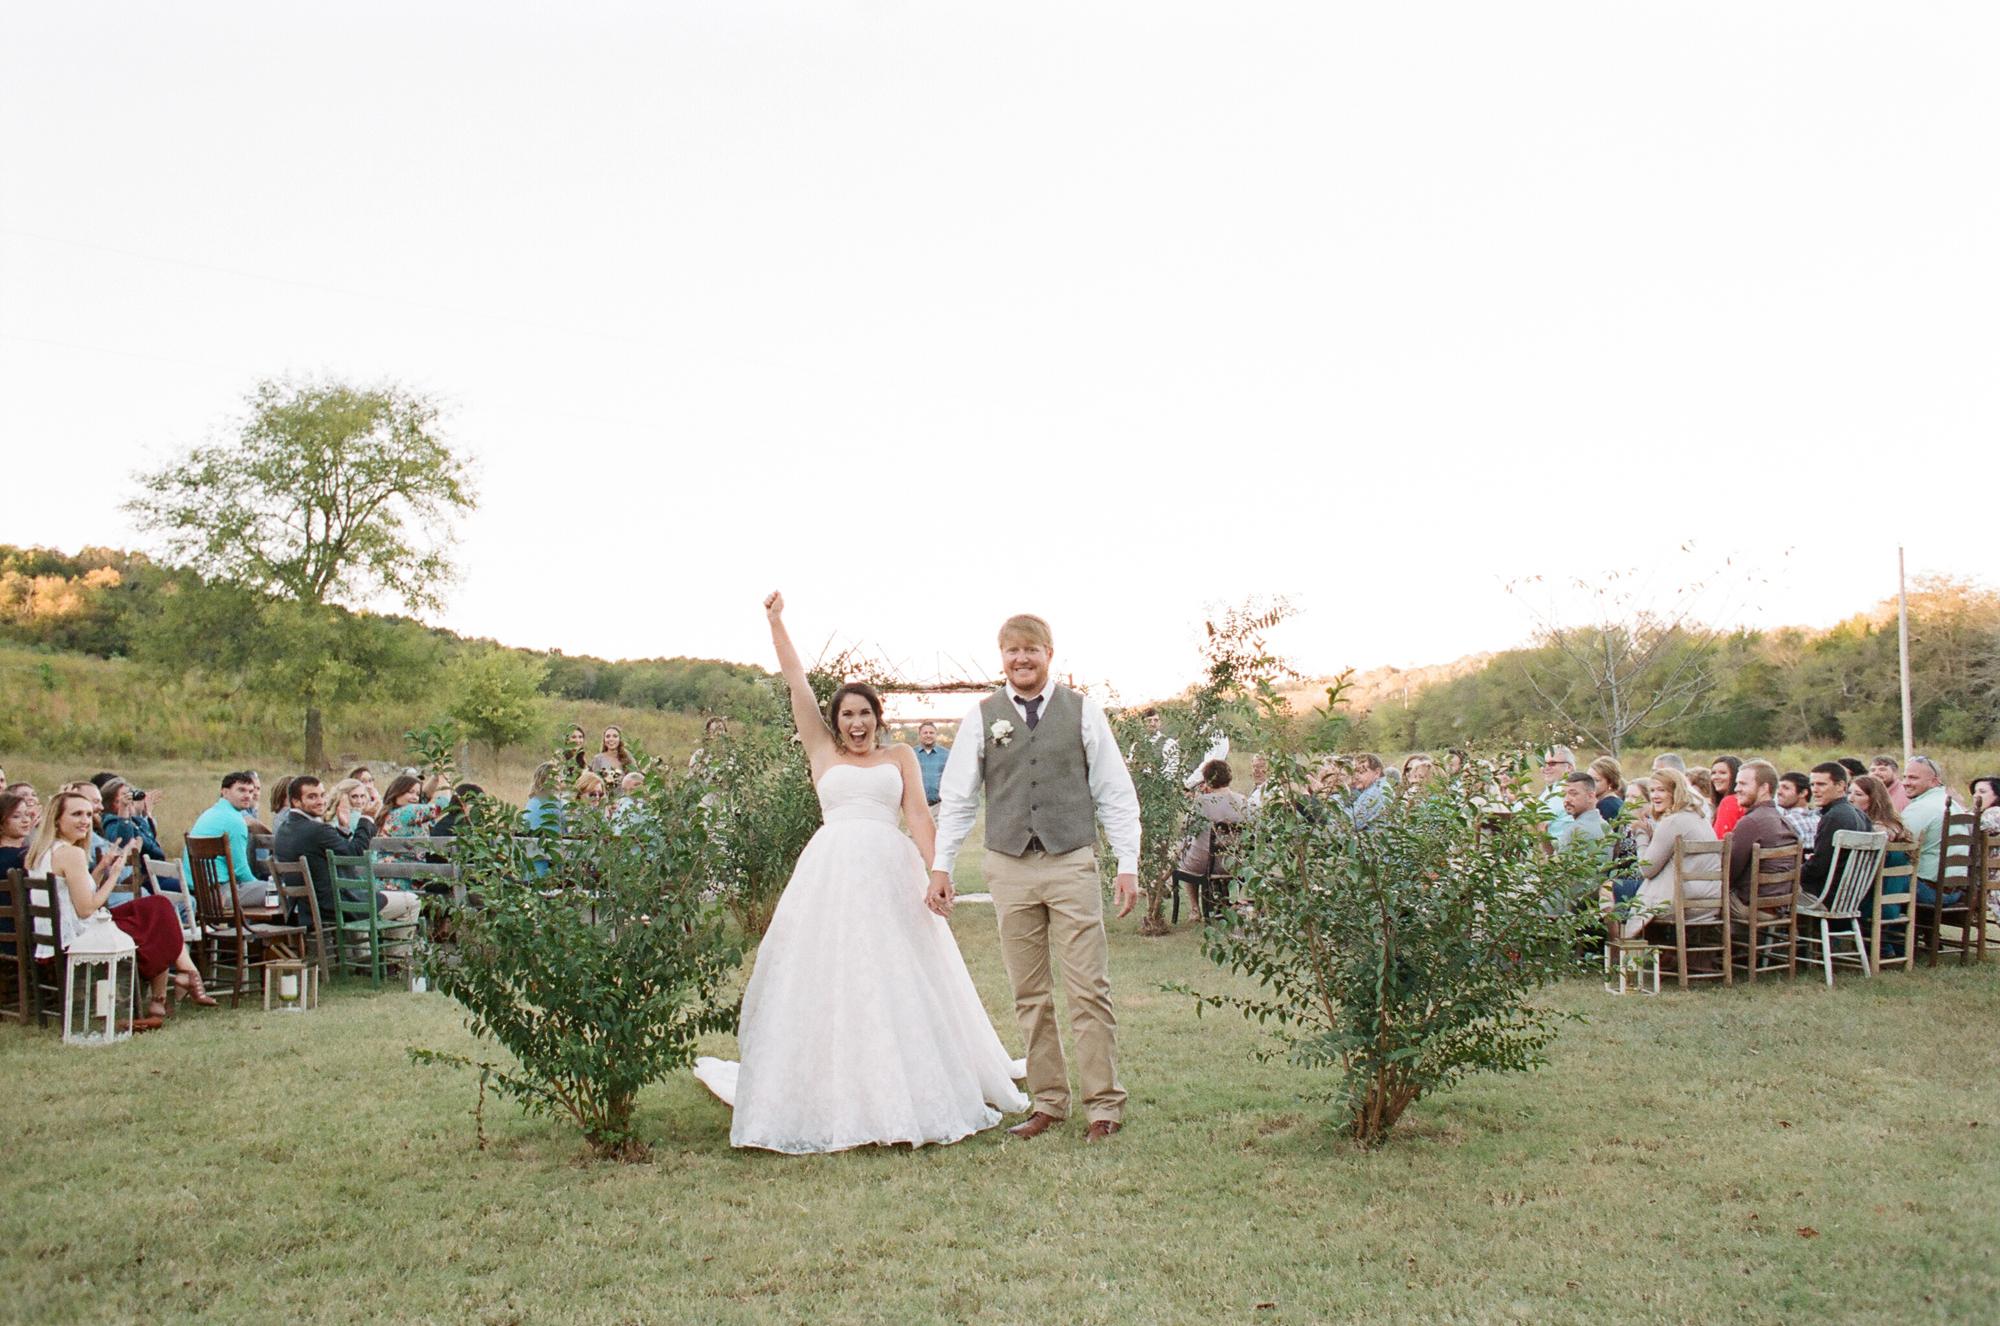 southern-weddings-film-photographer_0046.jpg